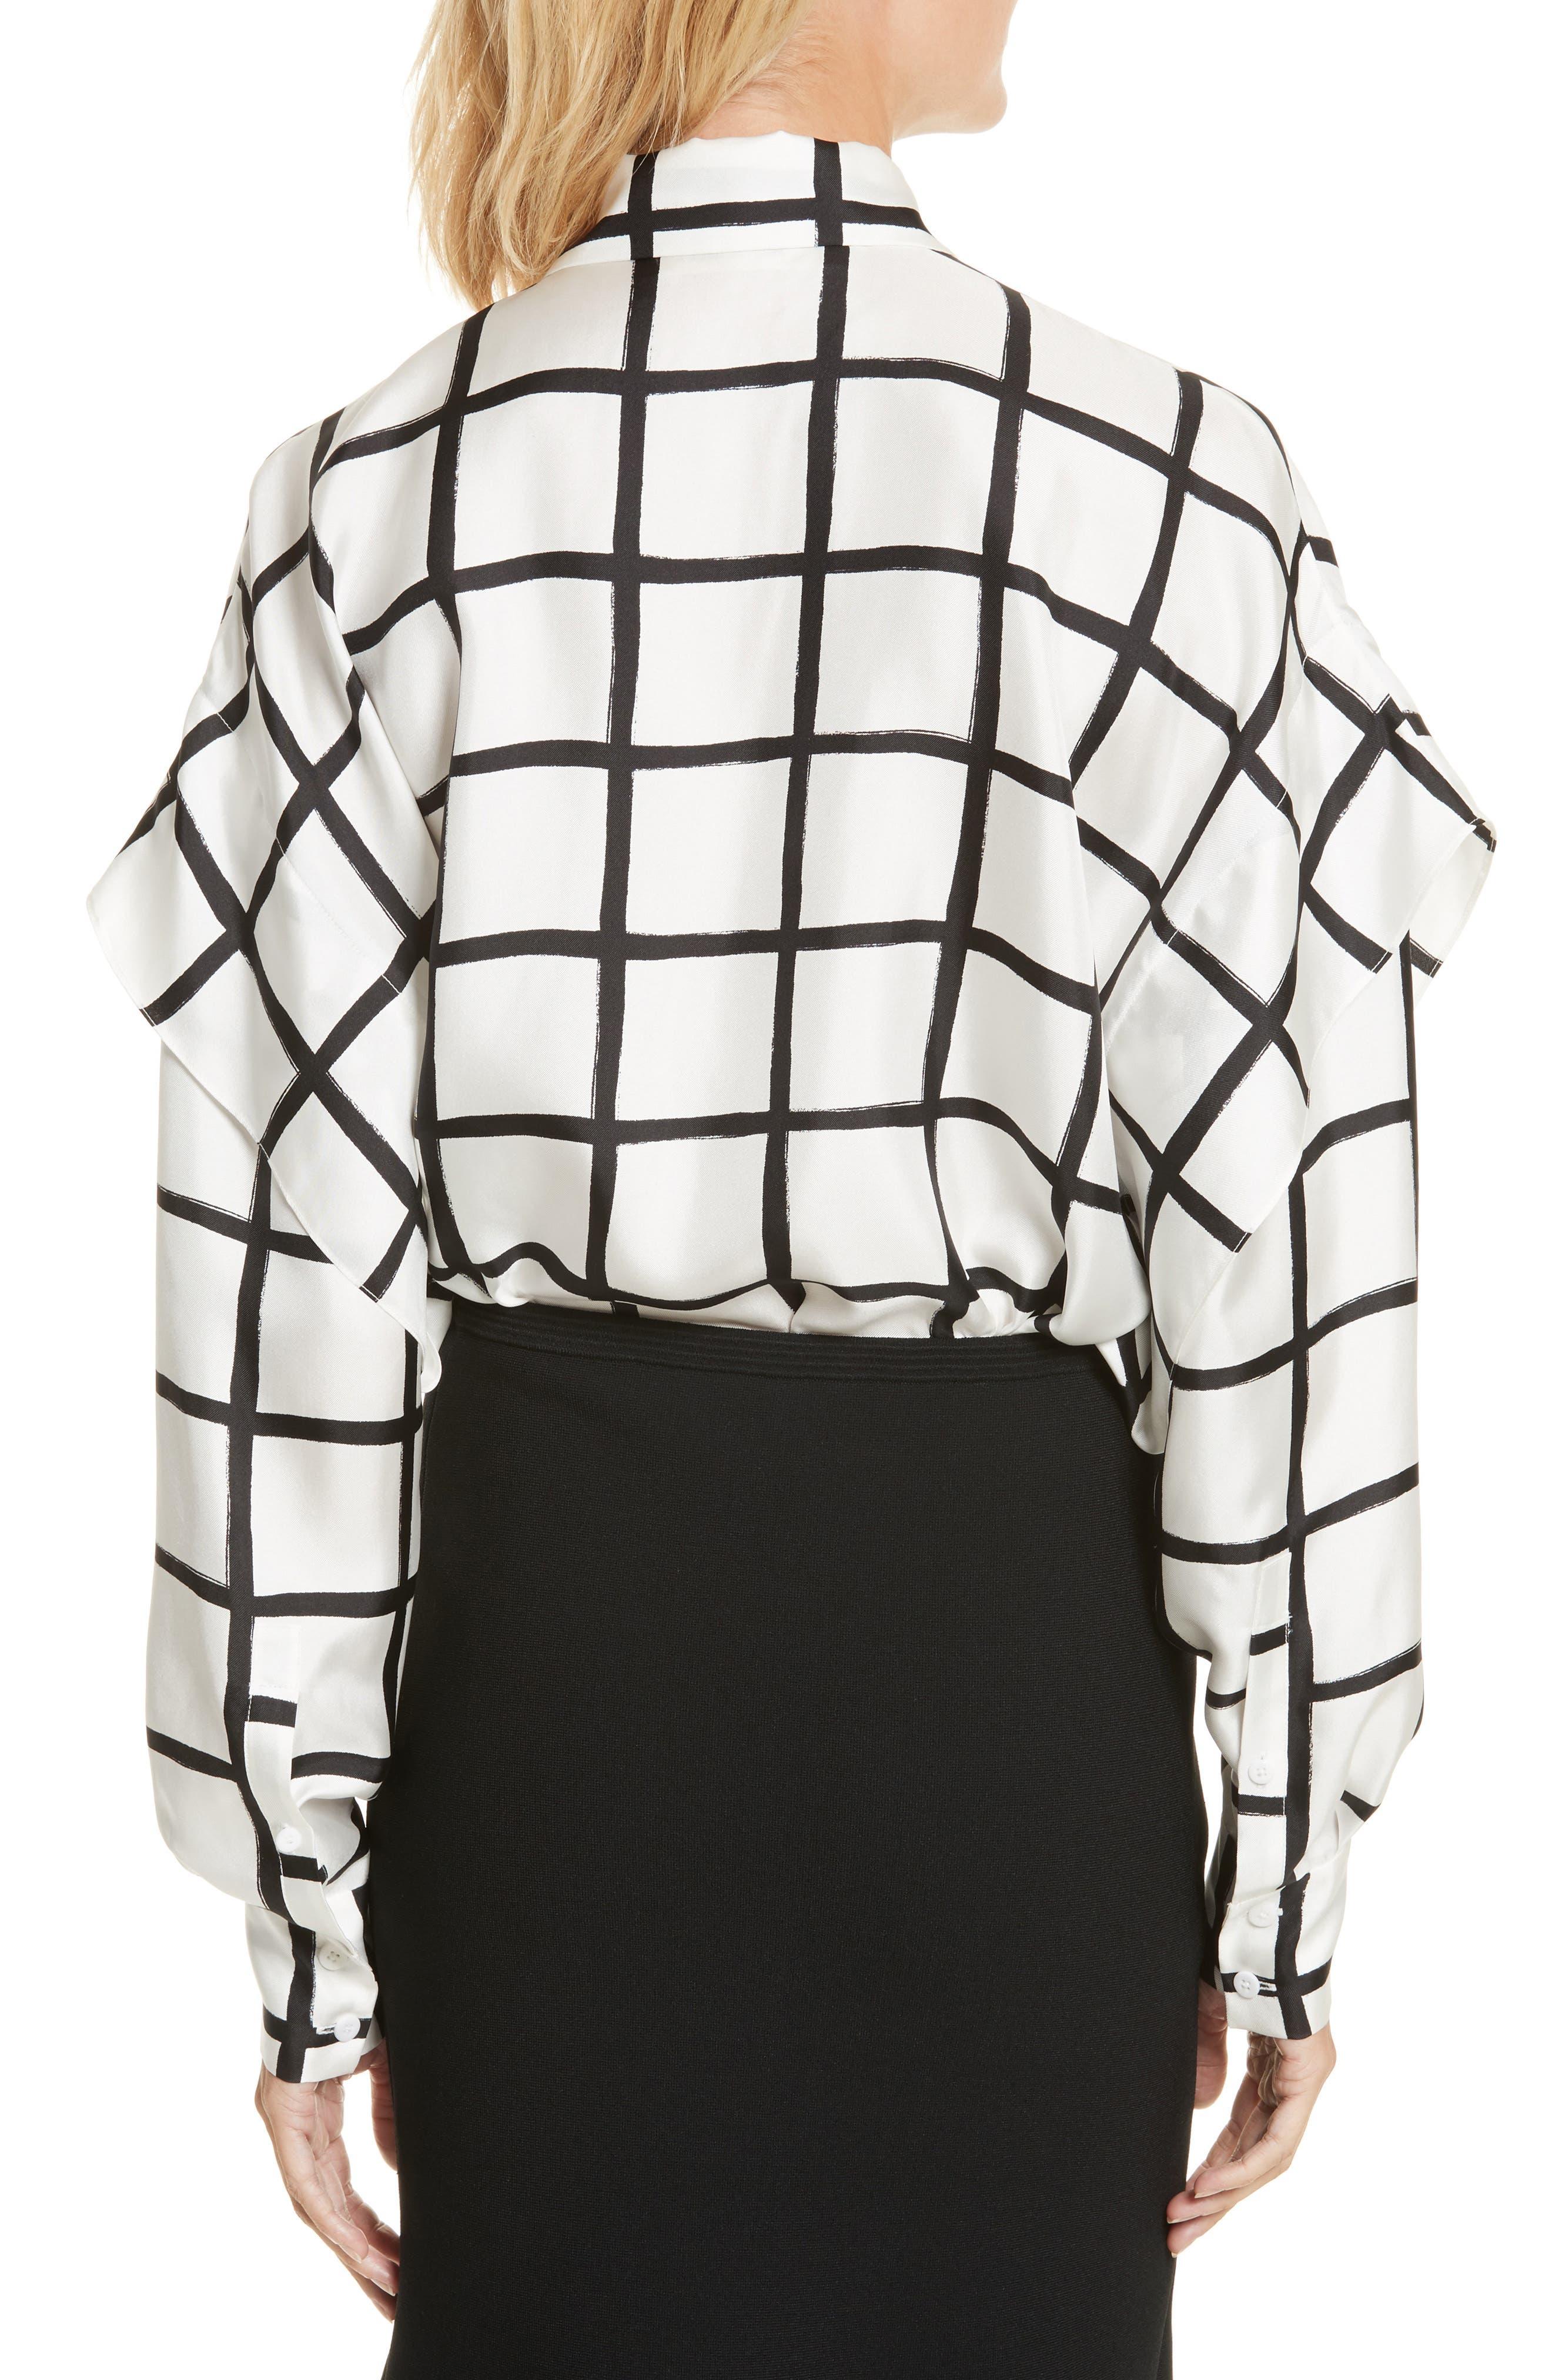 Diane von Furstenberg Windowpane Plaid Button Down Silk Shirt,                             Alternate thumbnail 2, color,                             178